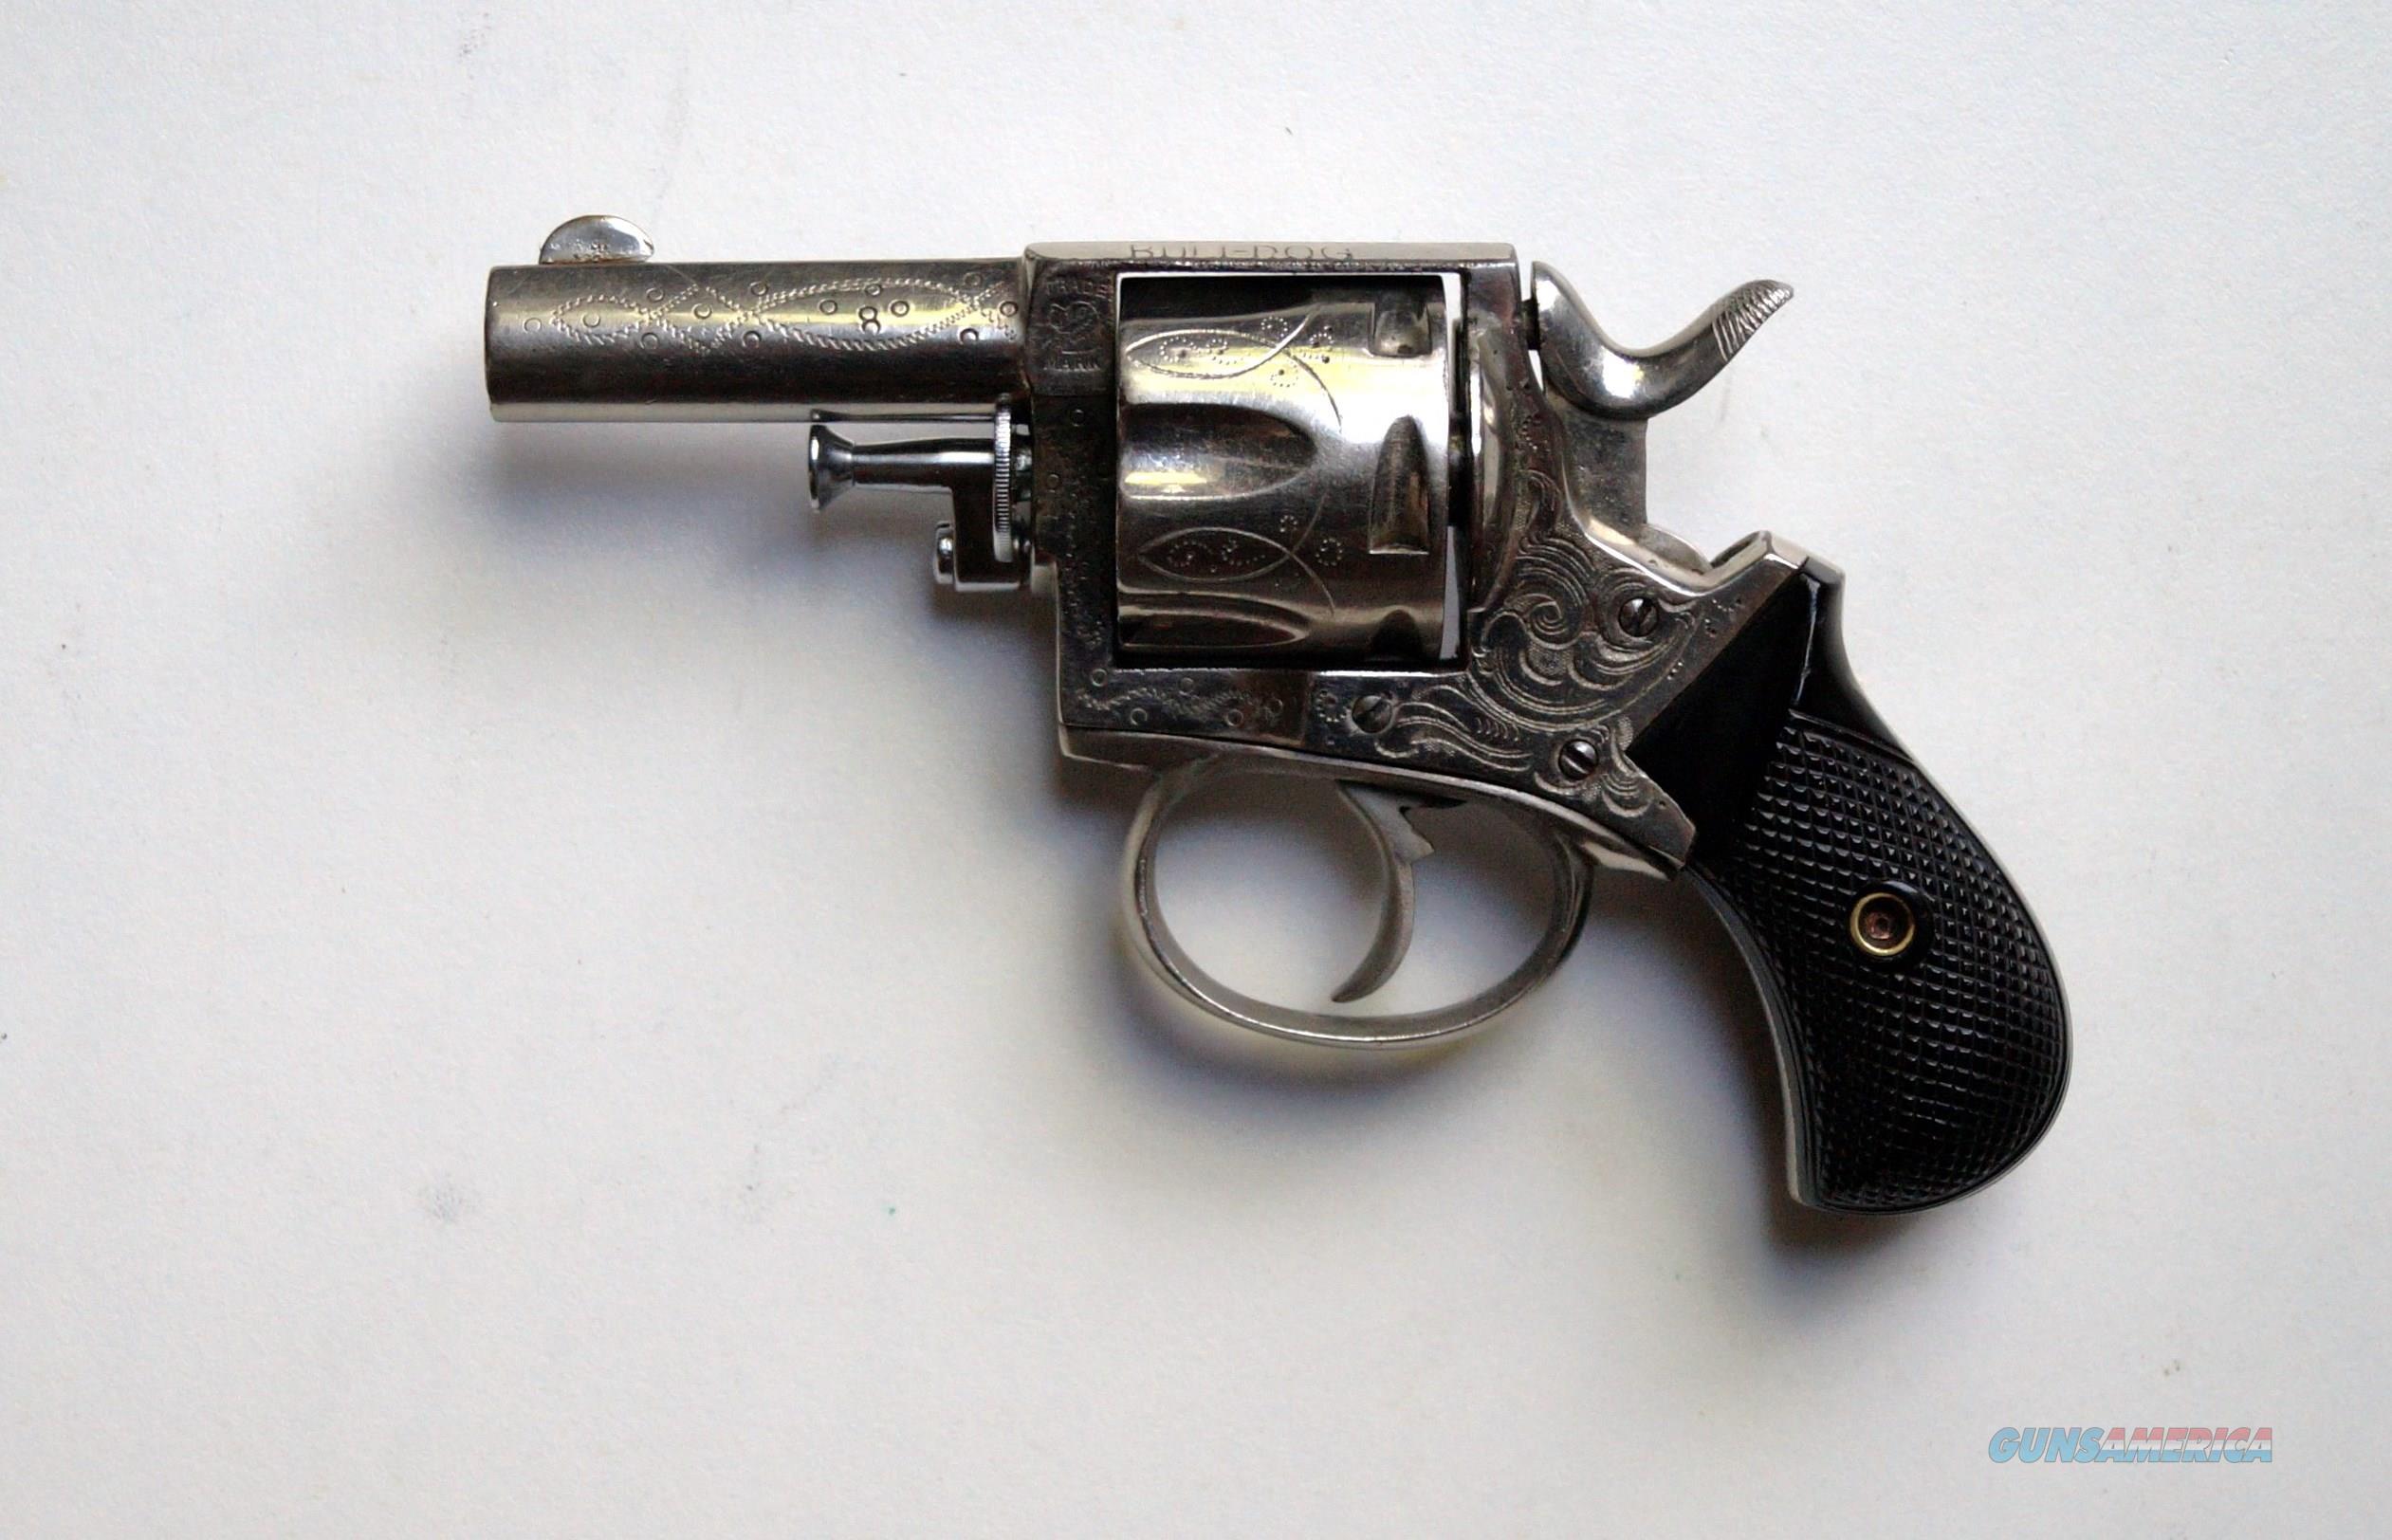 FOREHAND & WADSWORTH ENGRAVED ENGLISH BULLDOG  Guns > Pistols > Antique (Pre-1899) Pistols - Ctg. Misc.